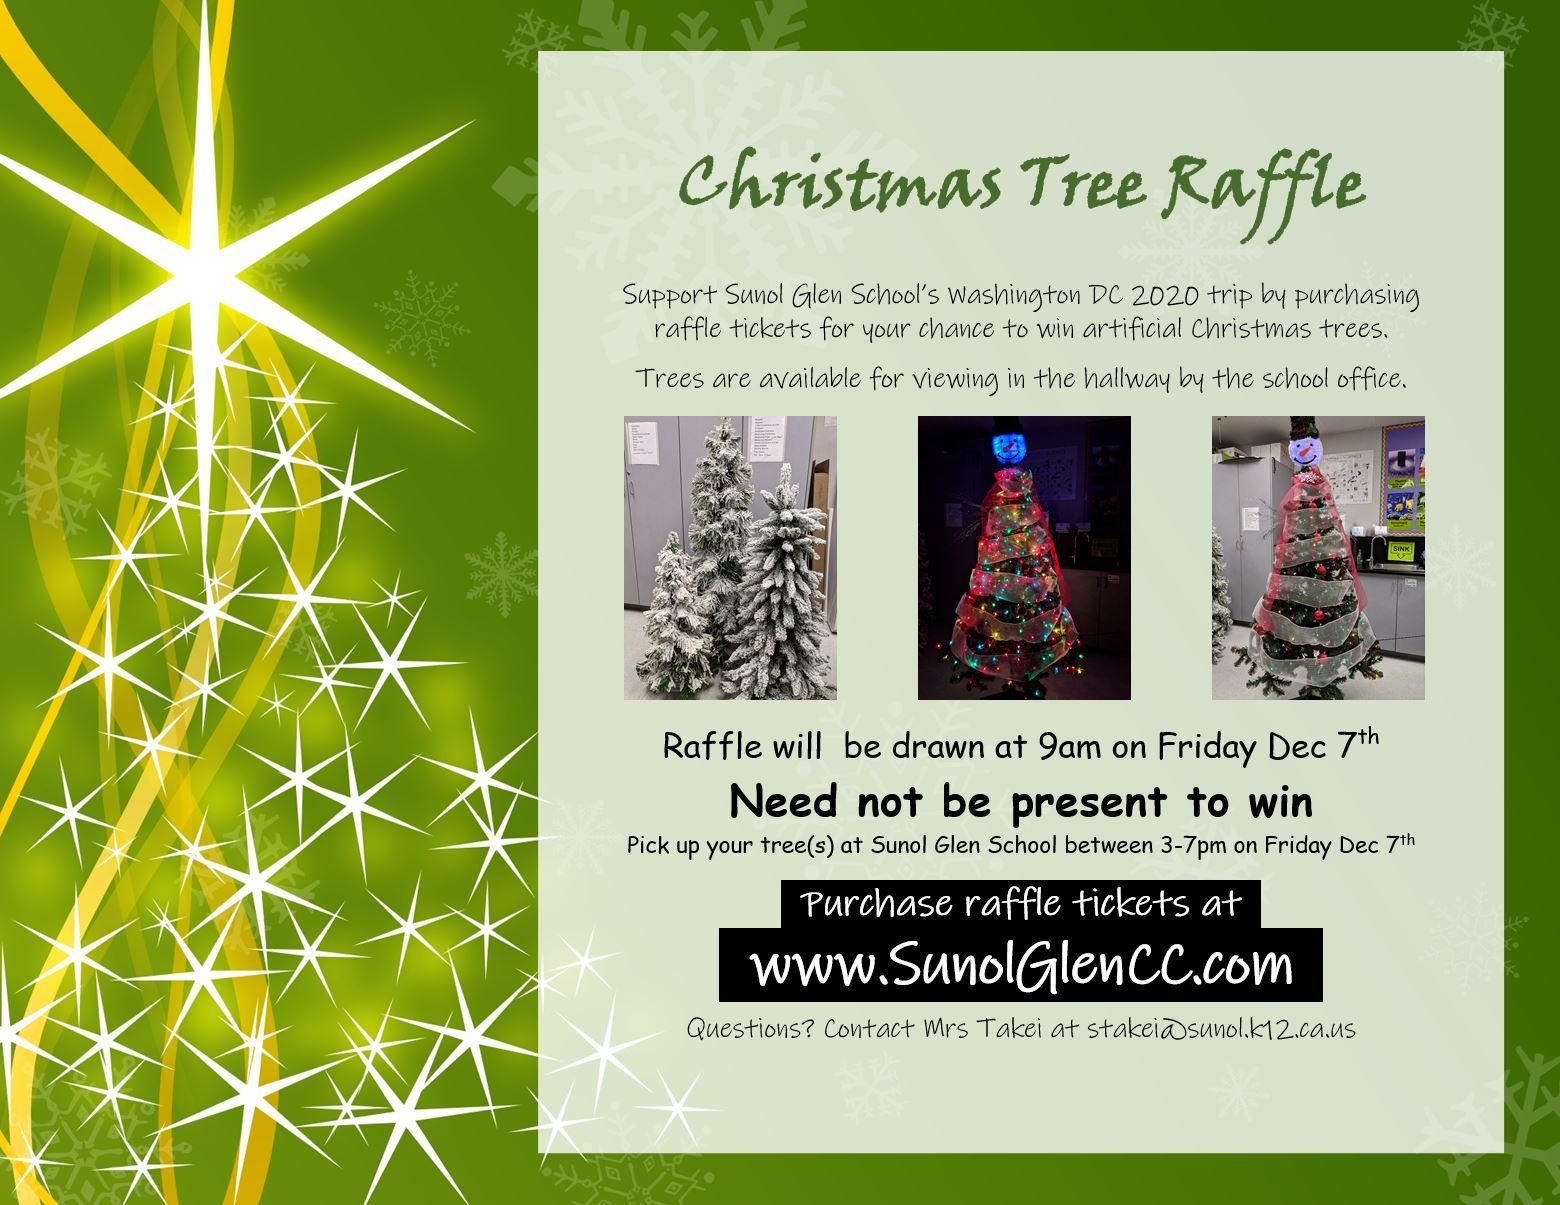 Washington DC 2020 Christmas Tree Raffle 2018   Sunol Glen School